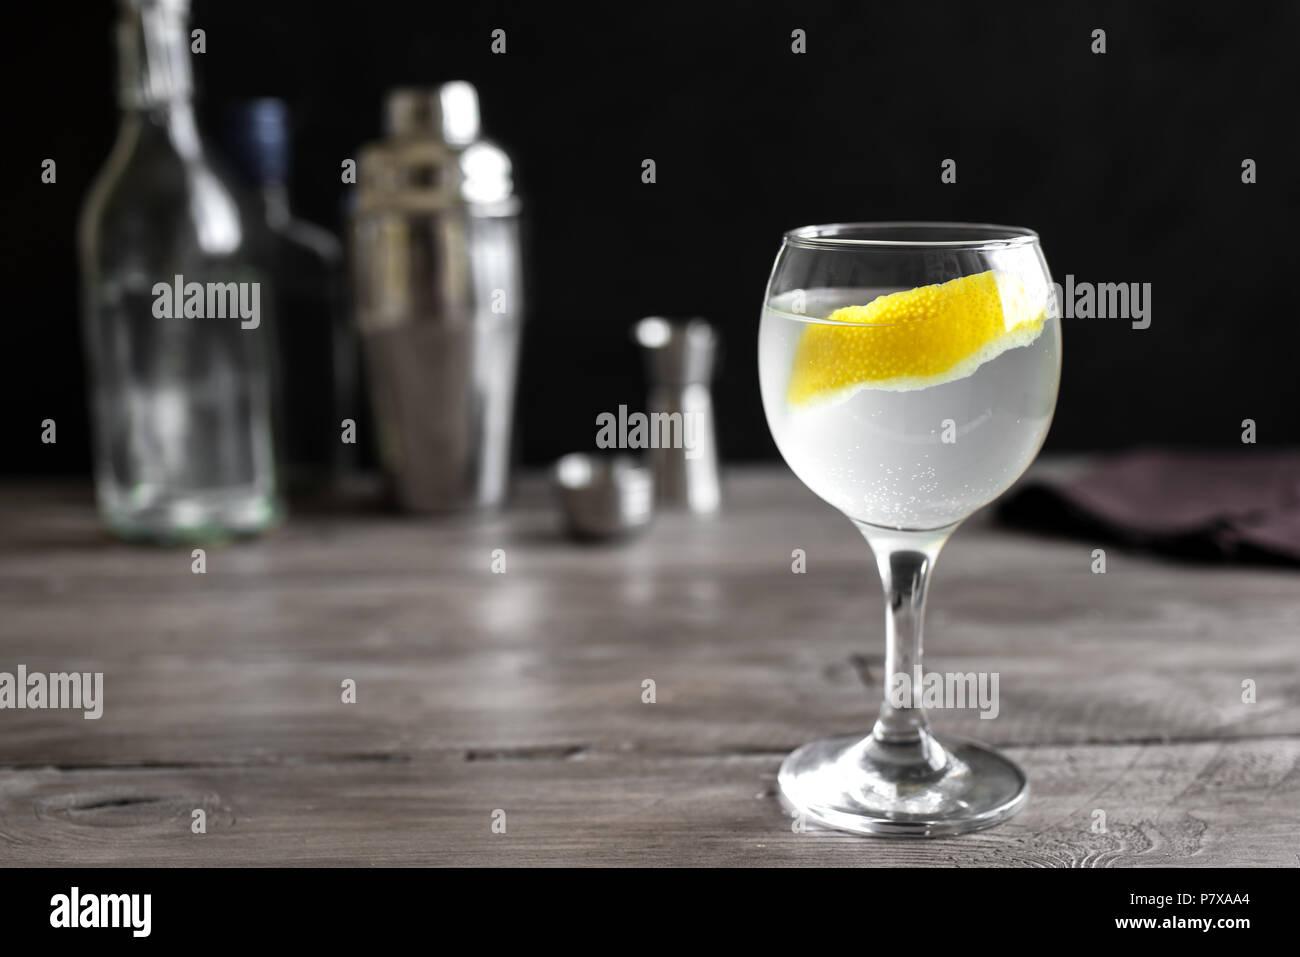 Vesper Martini Cocktail with lemon wedge. Homemade Vesper Cocktail on table, copy space. - Stock Image